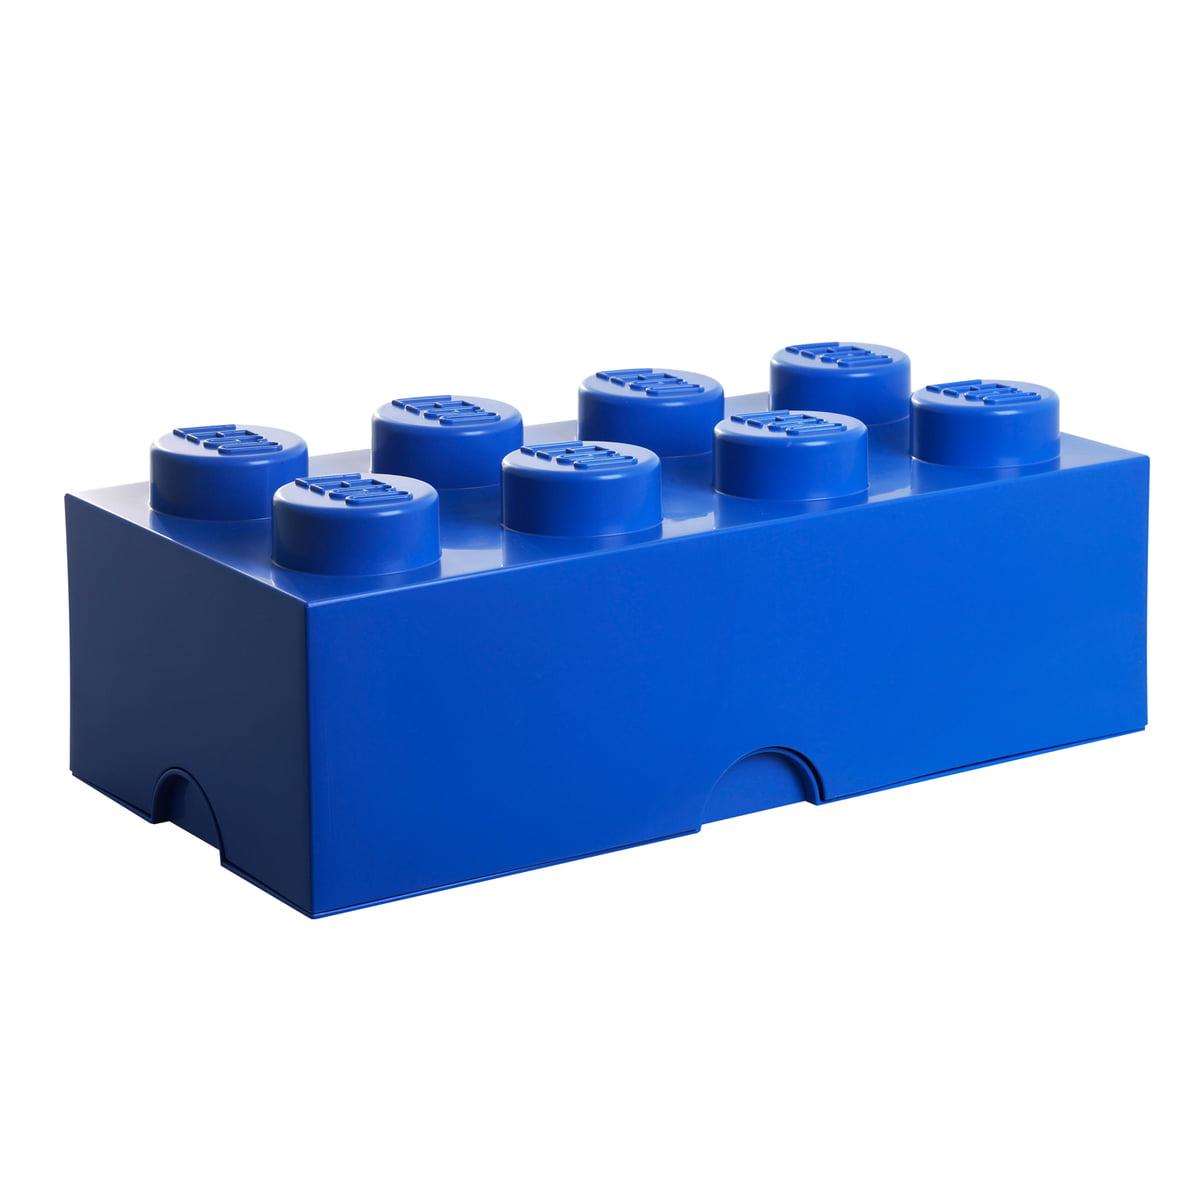 storage brick 8 by lego in the home design shop. Black Bedroom Furniture Sets. Home Design Ideas